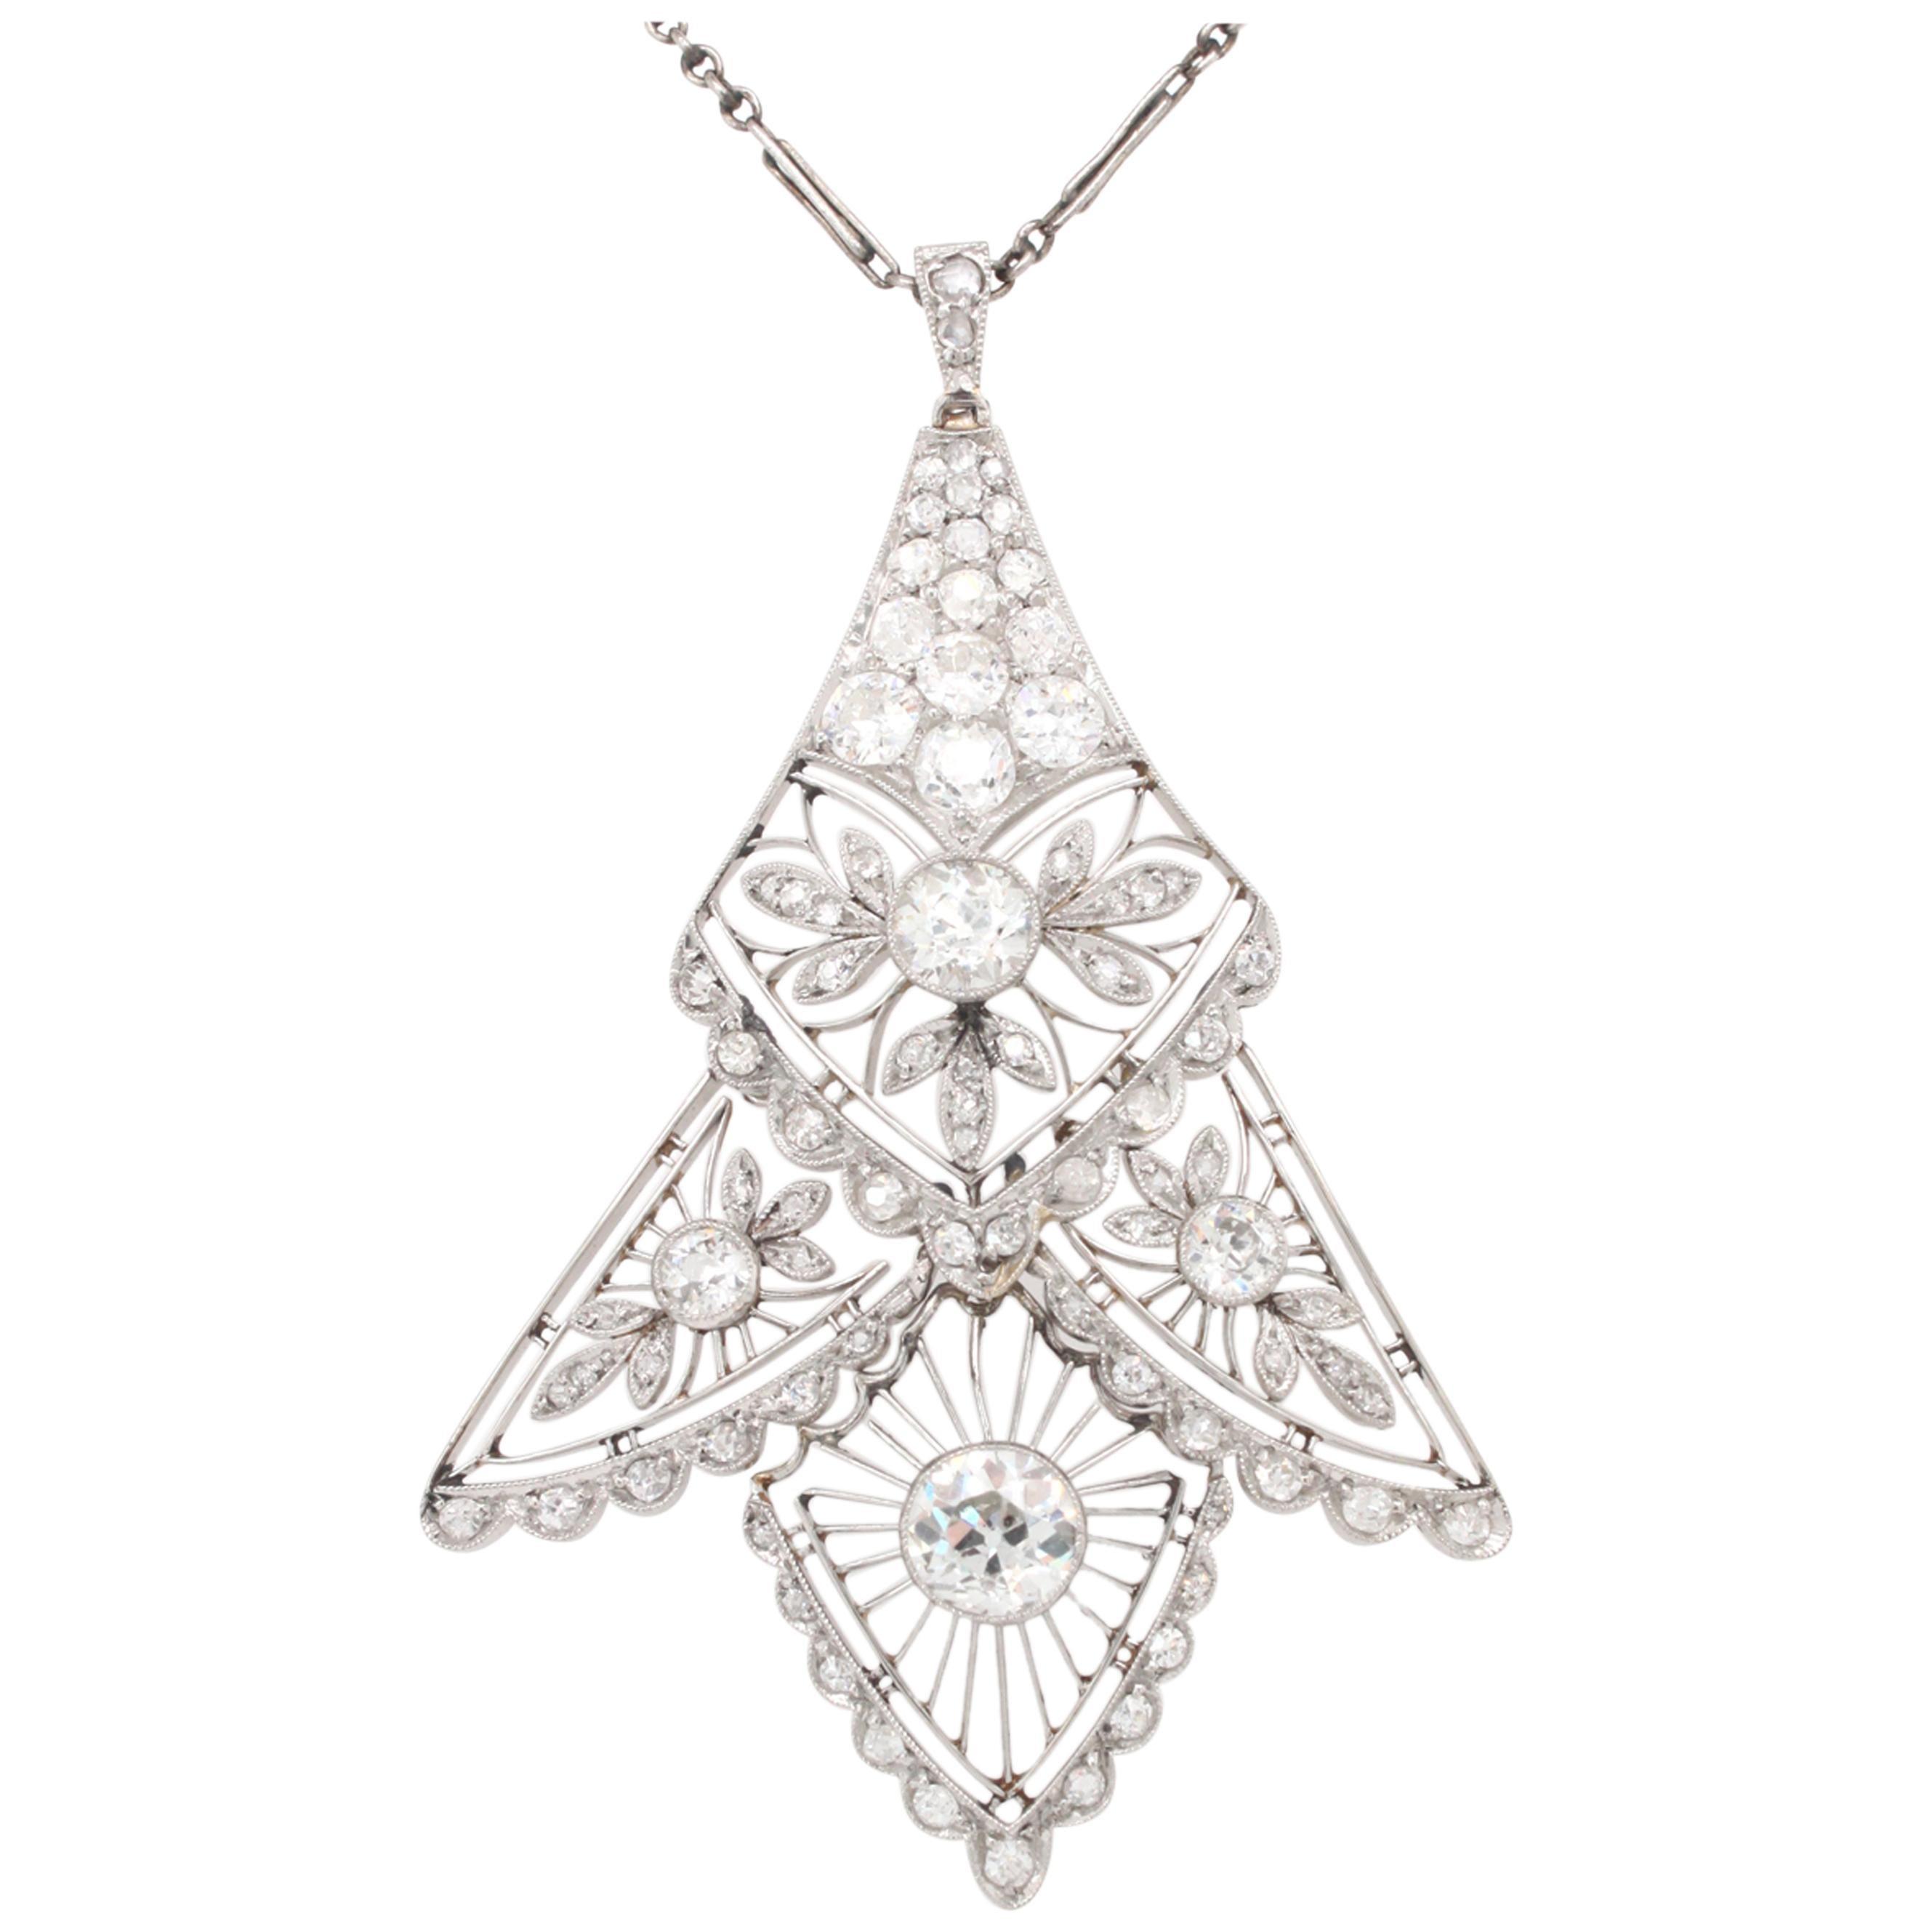 Edwardian Diamond Pendant, 1910s